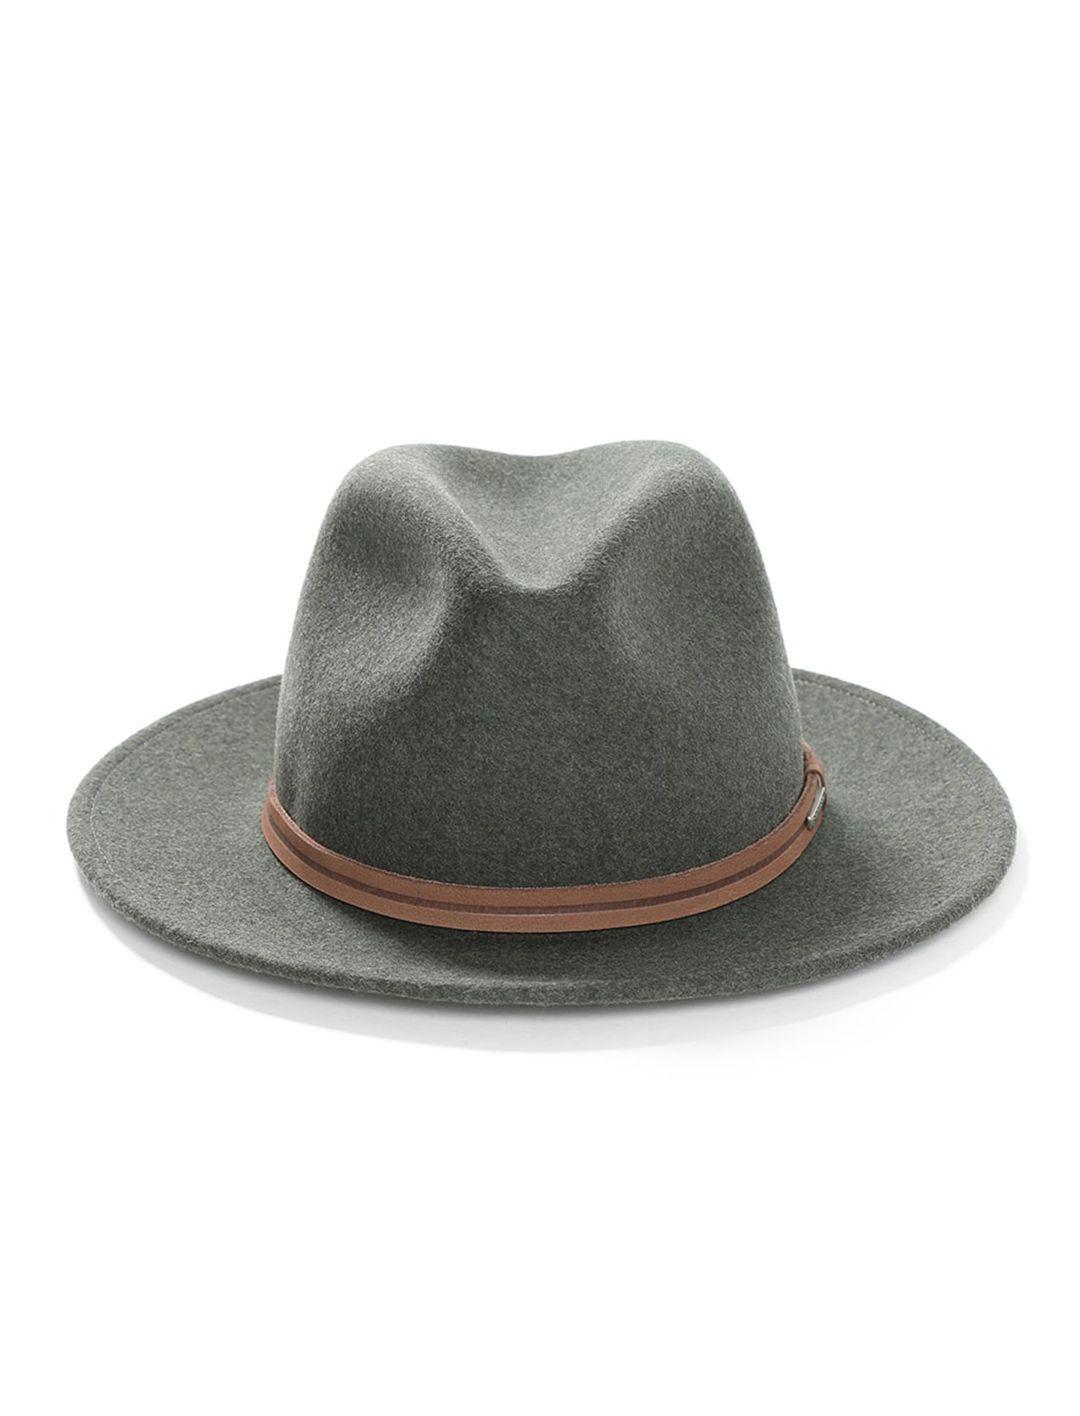 caca904f398 Stetson Explorer Outdoor Hat